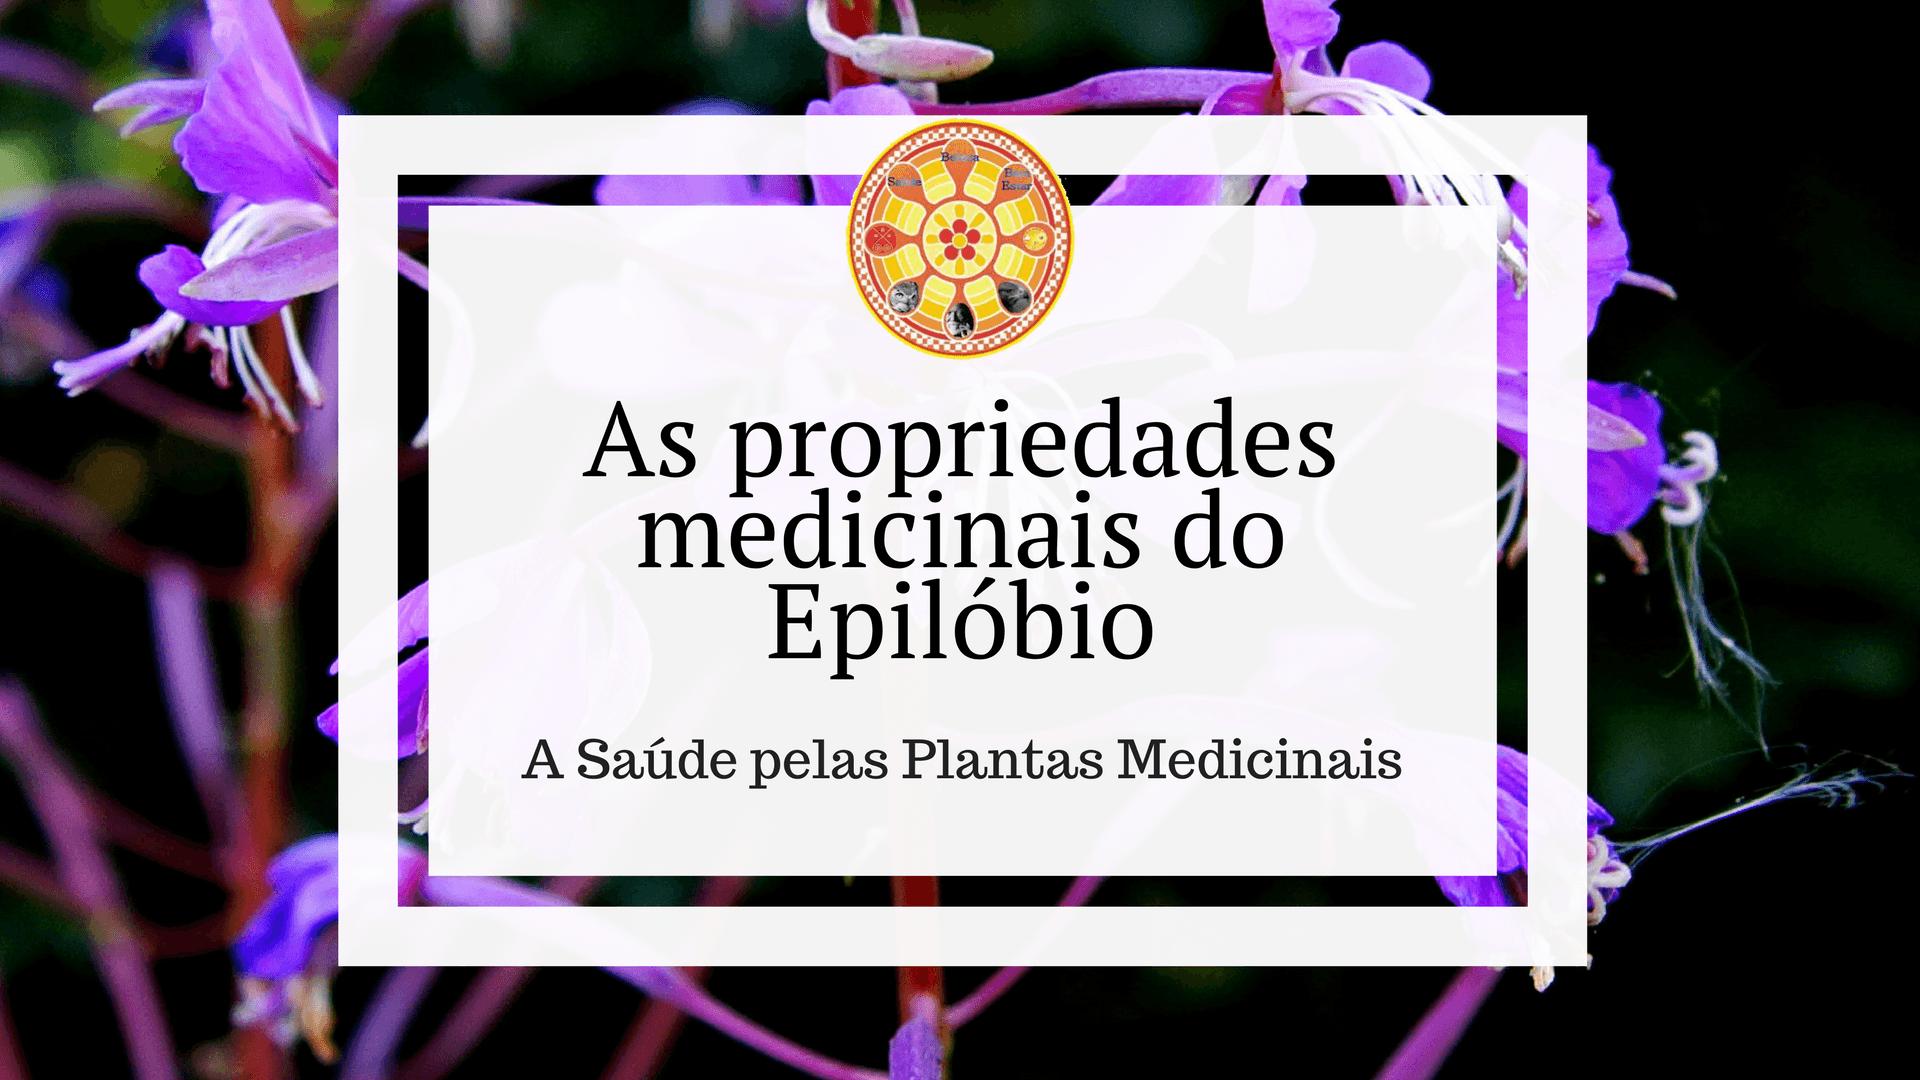 Epilóbio